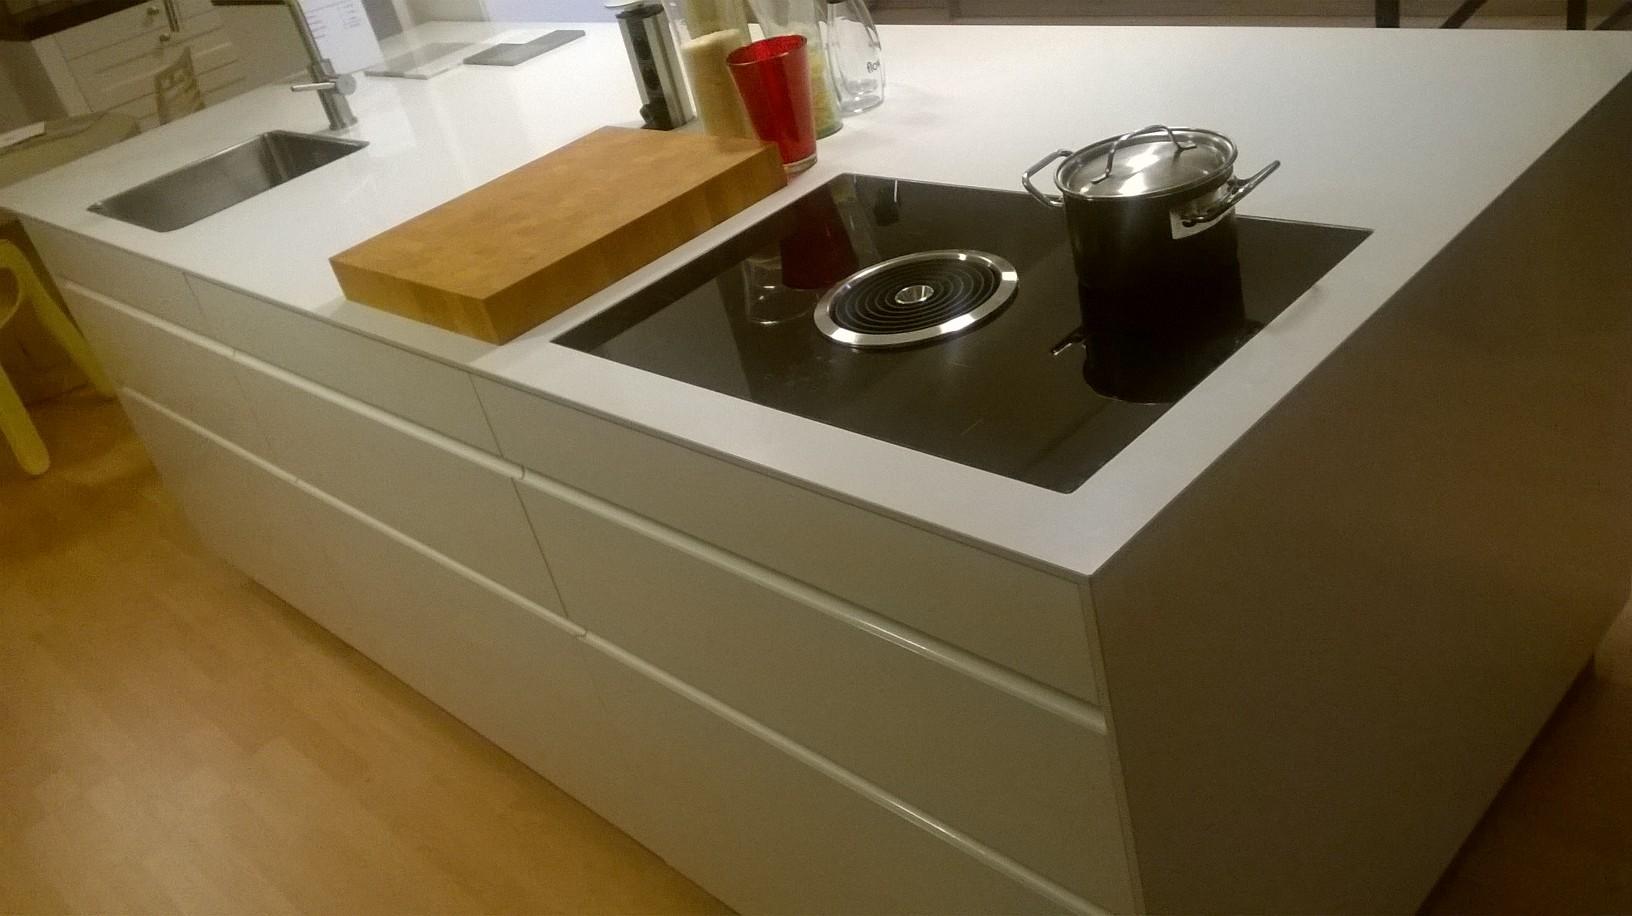 de bora basic kookplaat rikken keukens. Black Bedroom Furniture Sets. Home Design Ideas